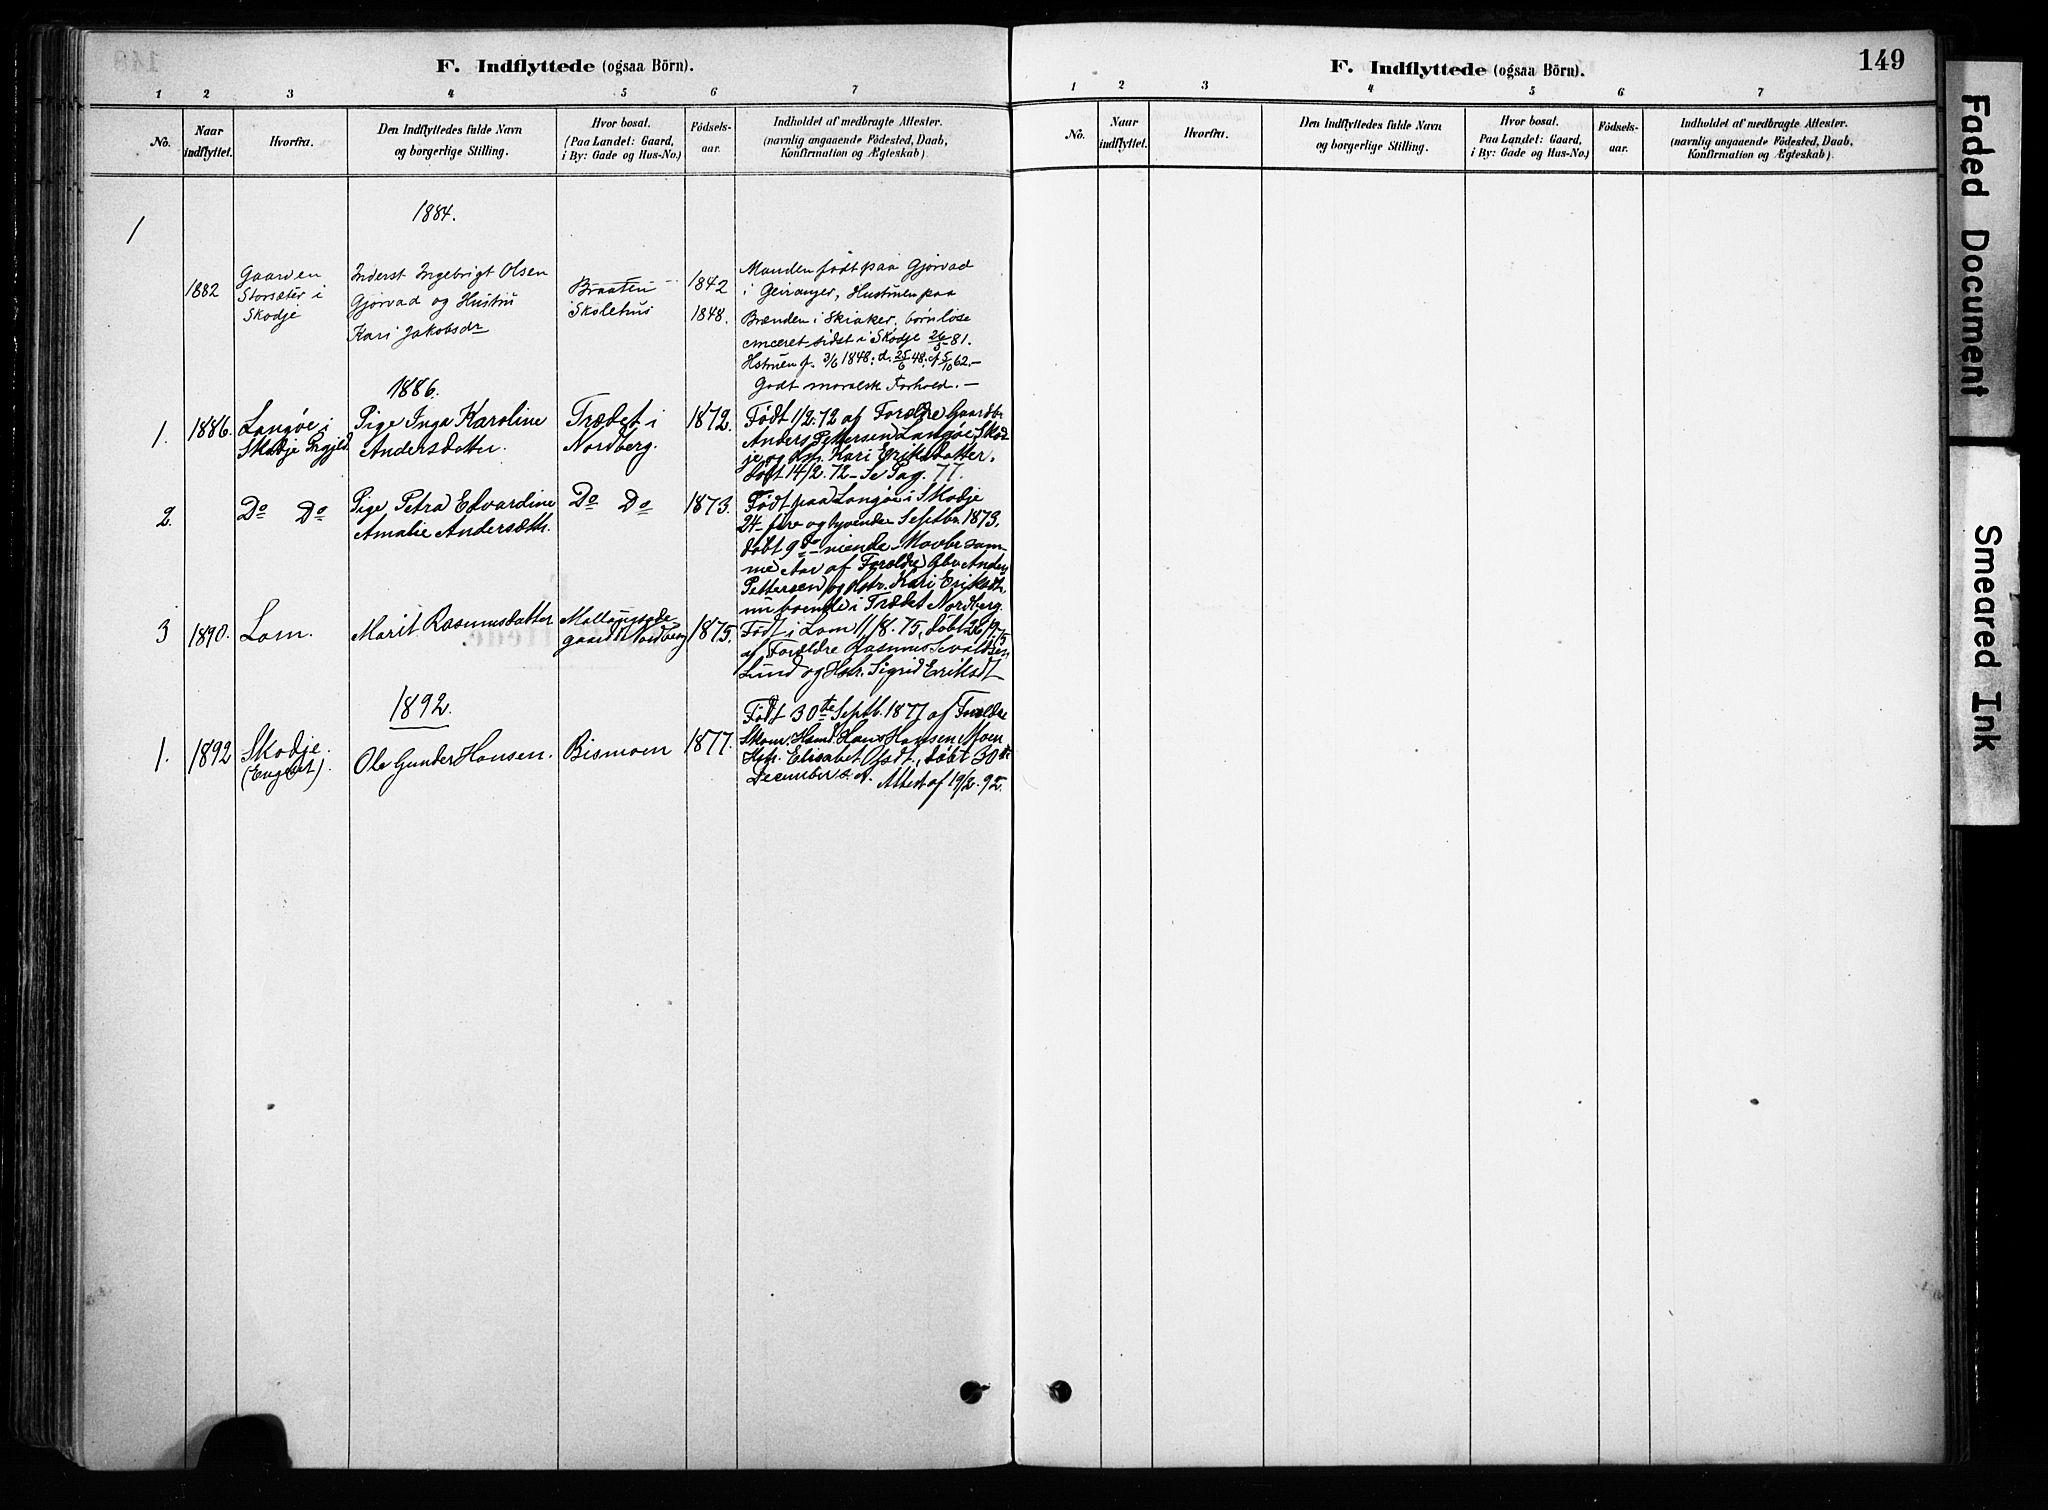 SAH, Skjåk prestekontor, Ministerialbok nr. 4, 1880-1904, s. 149